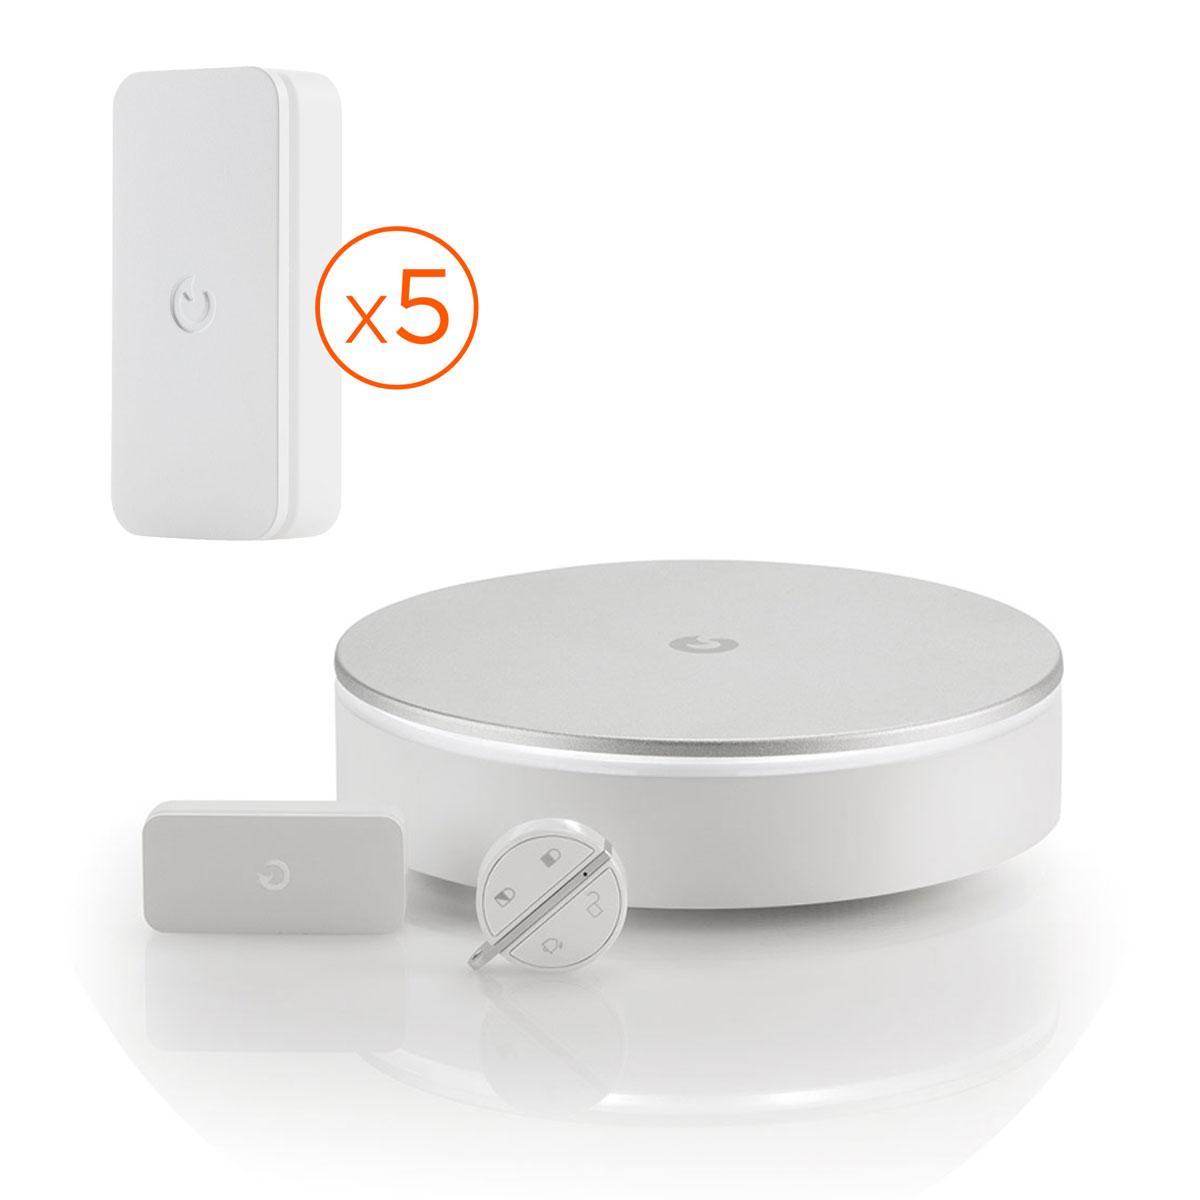 myfox home alarm pack d tection kit alarme myfox sur. Black Bedroom Furniture Sets. Home Design Ideas